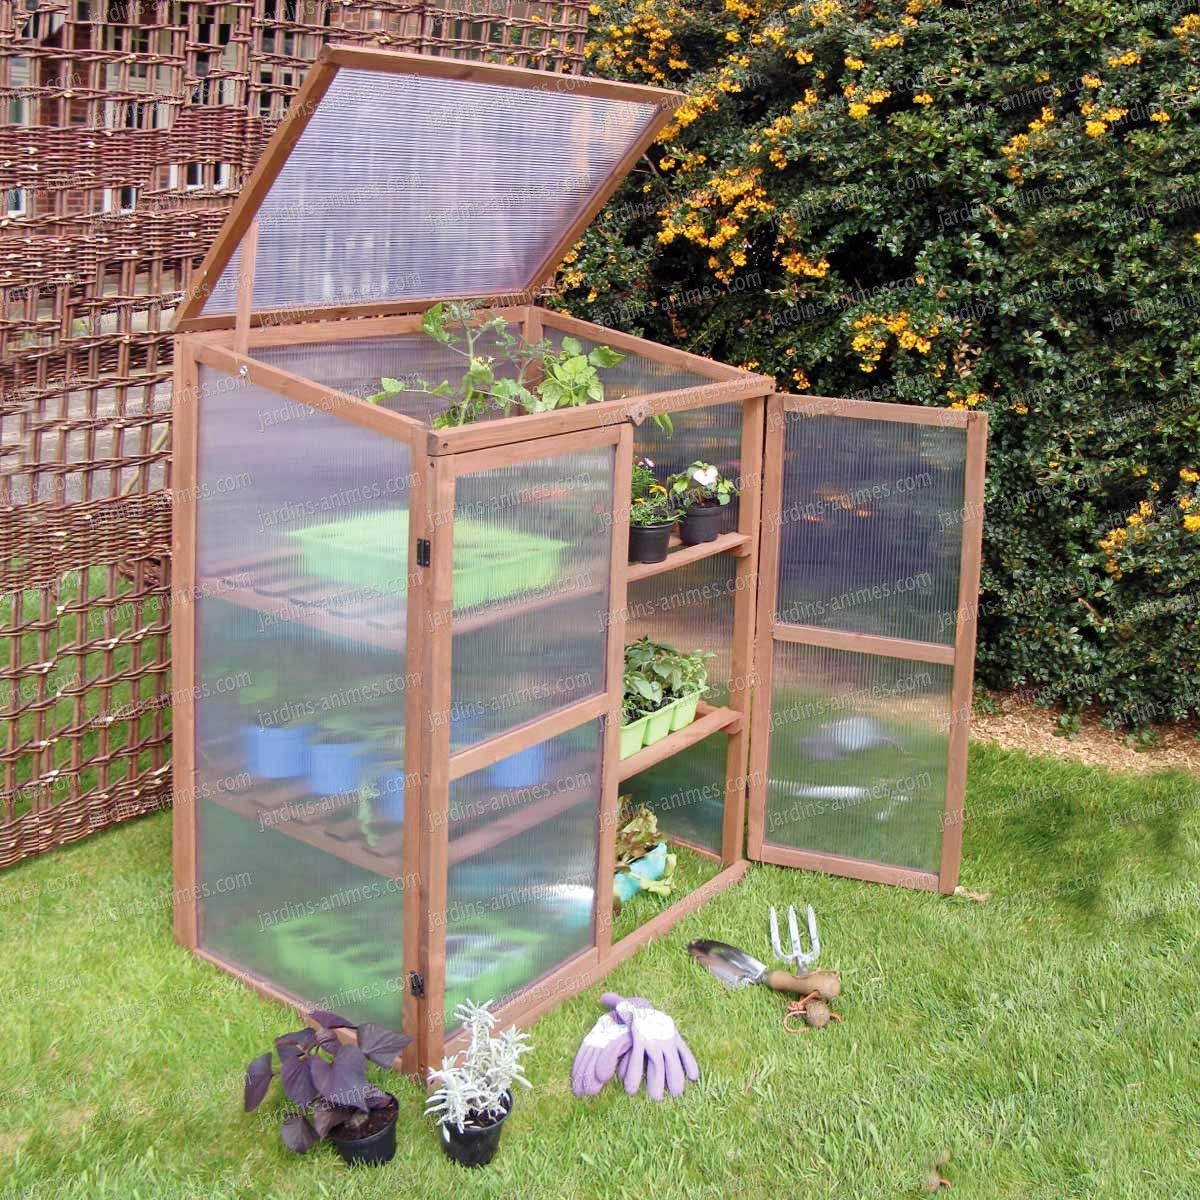 Petite Serre De Balcon Terrasse En Bois | Jardinage | Serre ... à Fabriquer Serre De Jardin Polycarbonate